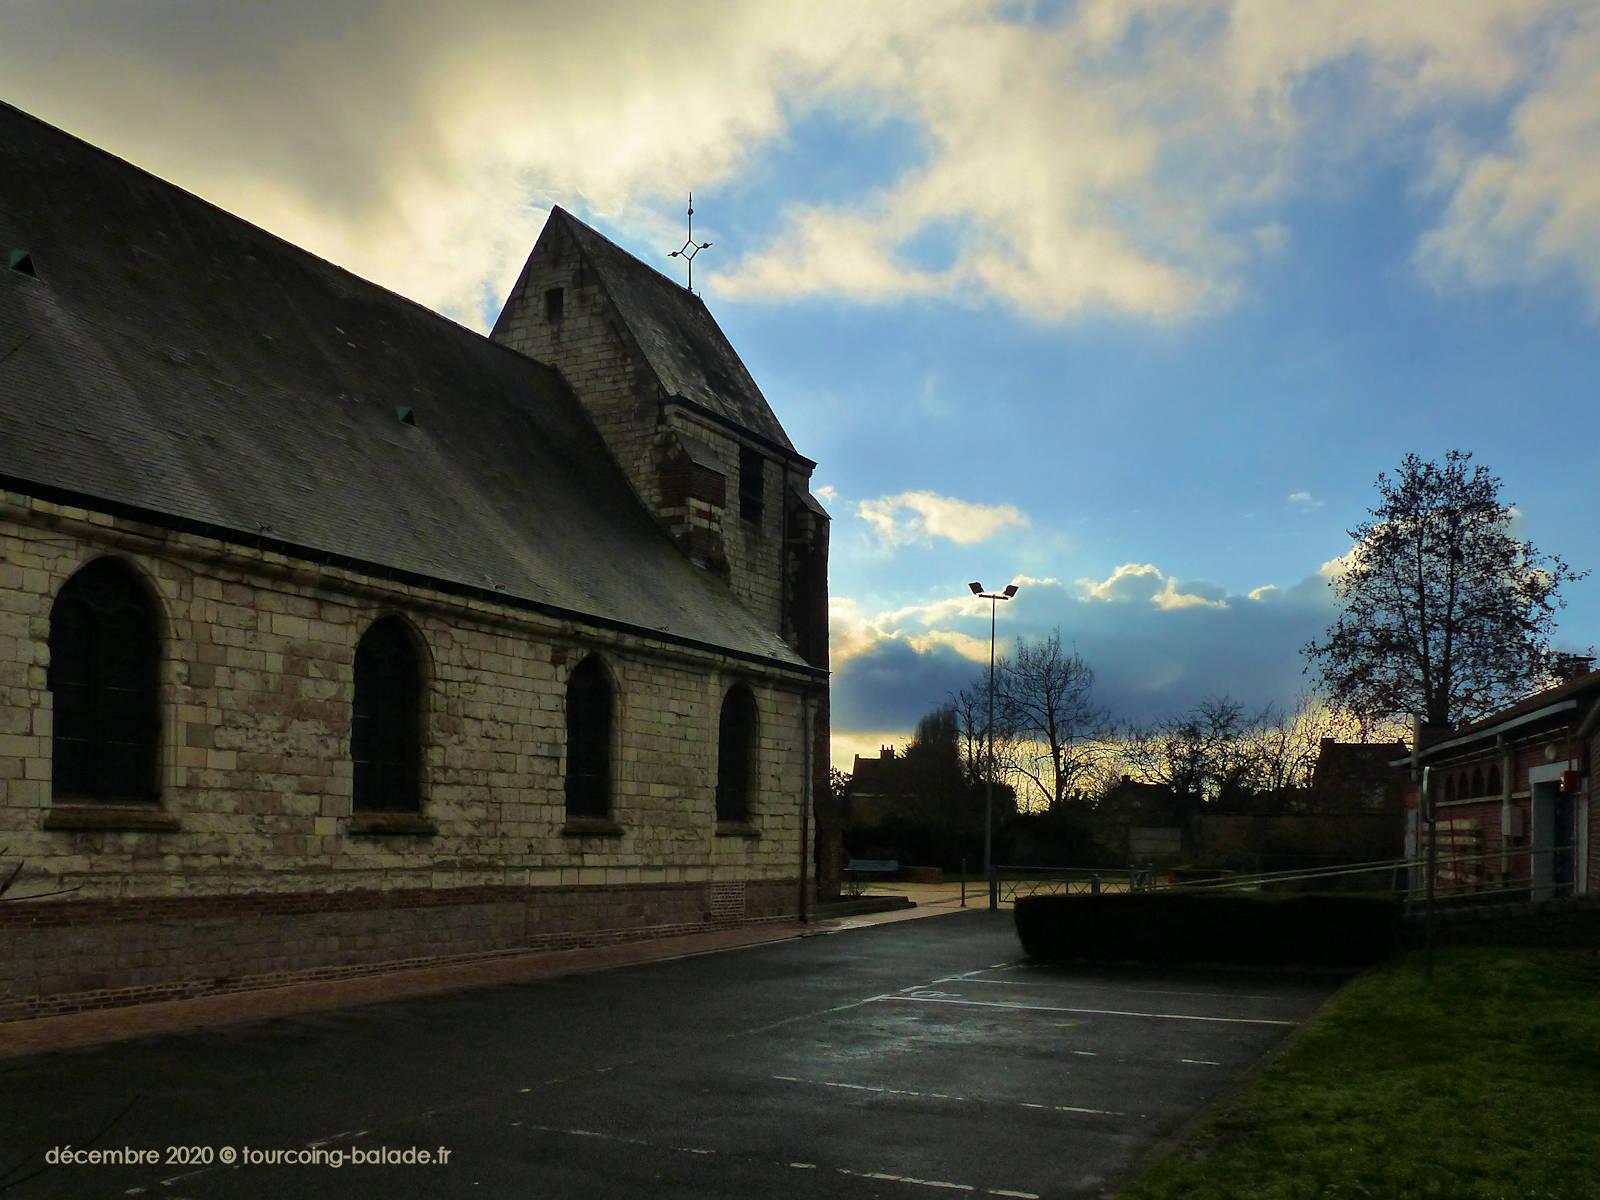 Faches-Thumesnil Hiver 2020 - église Sainte Marguerite